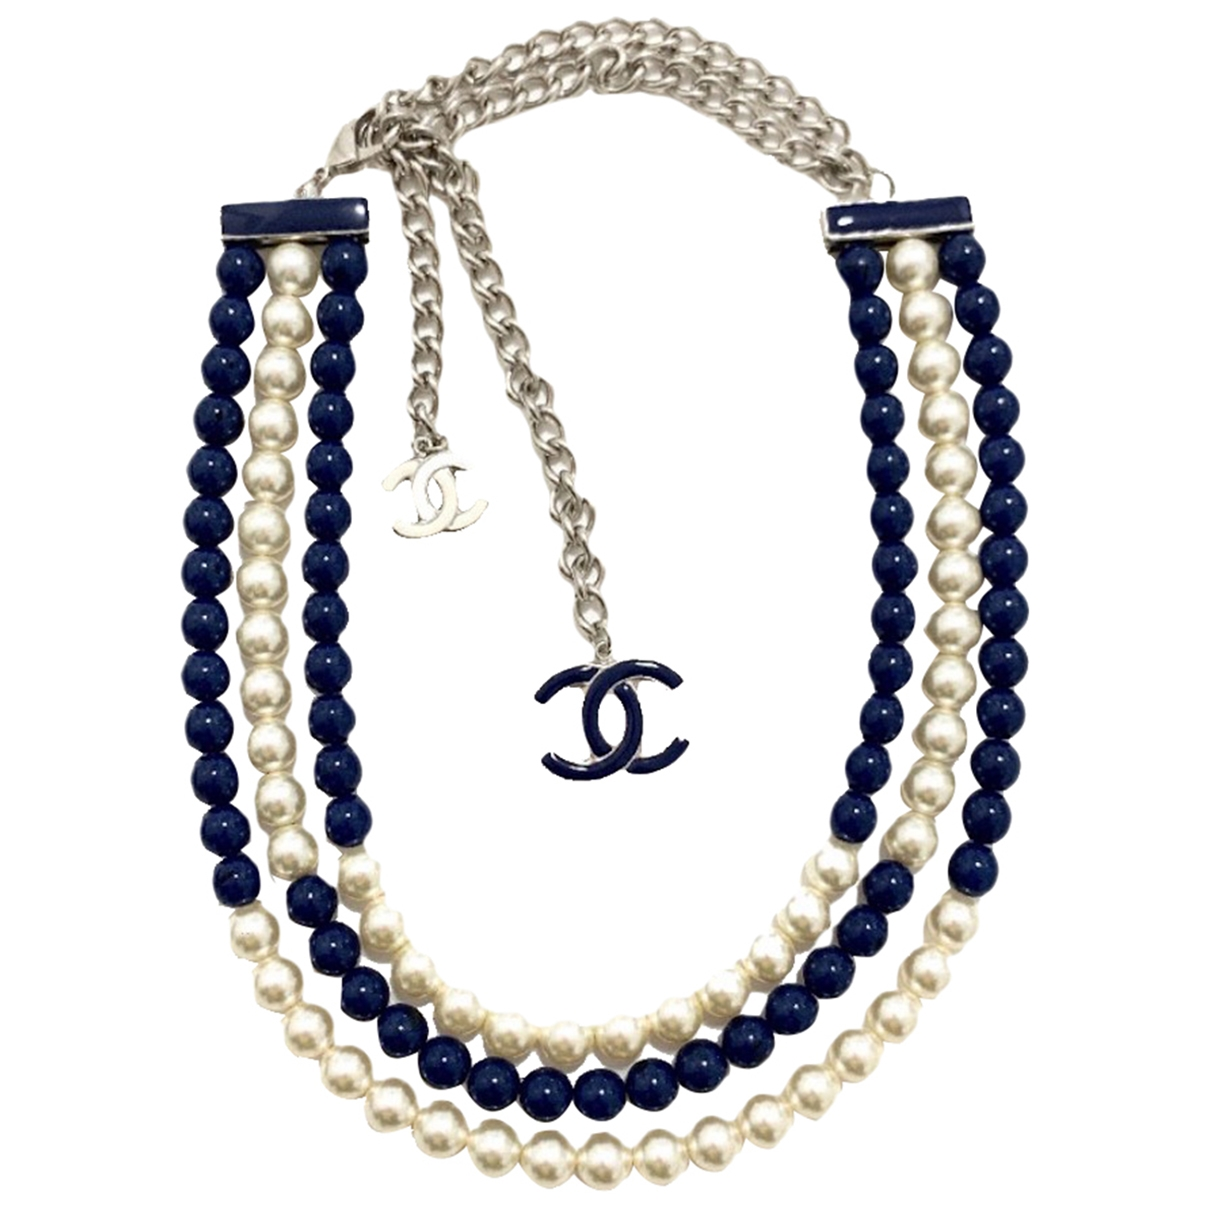 Chanel \N Halskette in  Blau Perlen